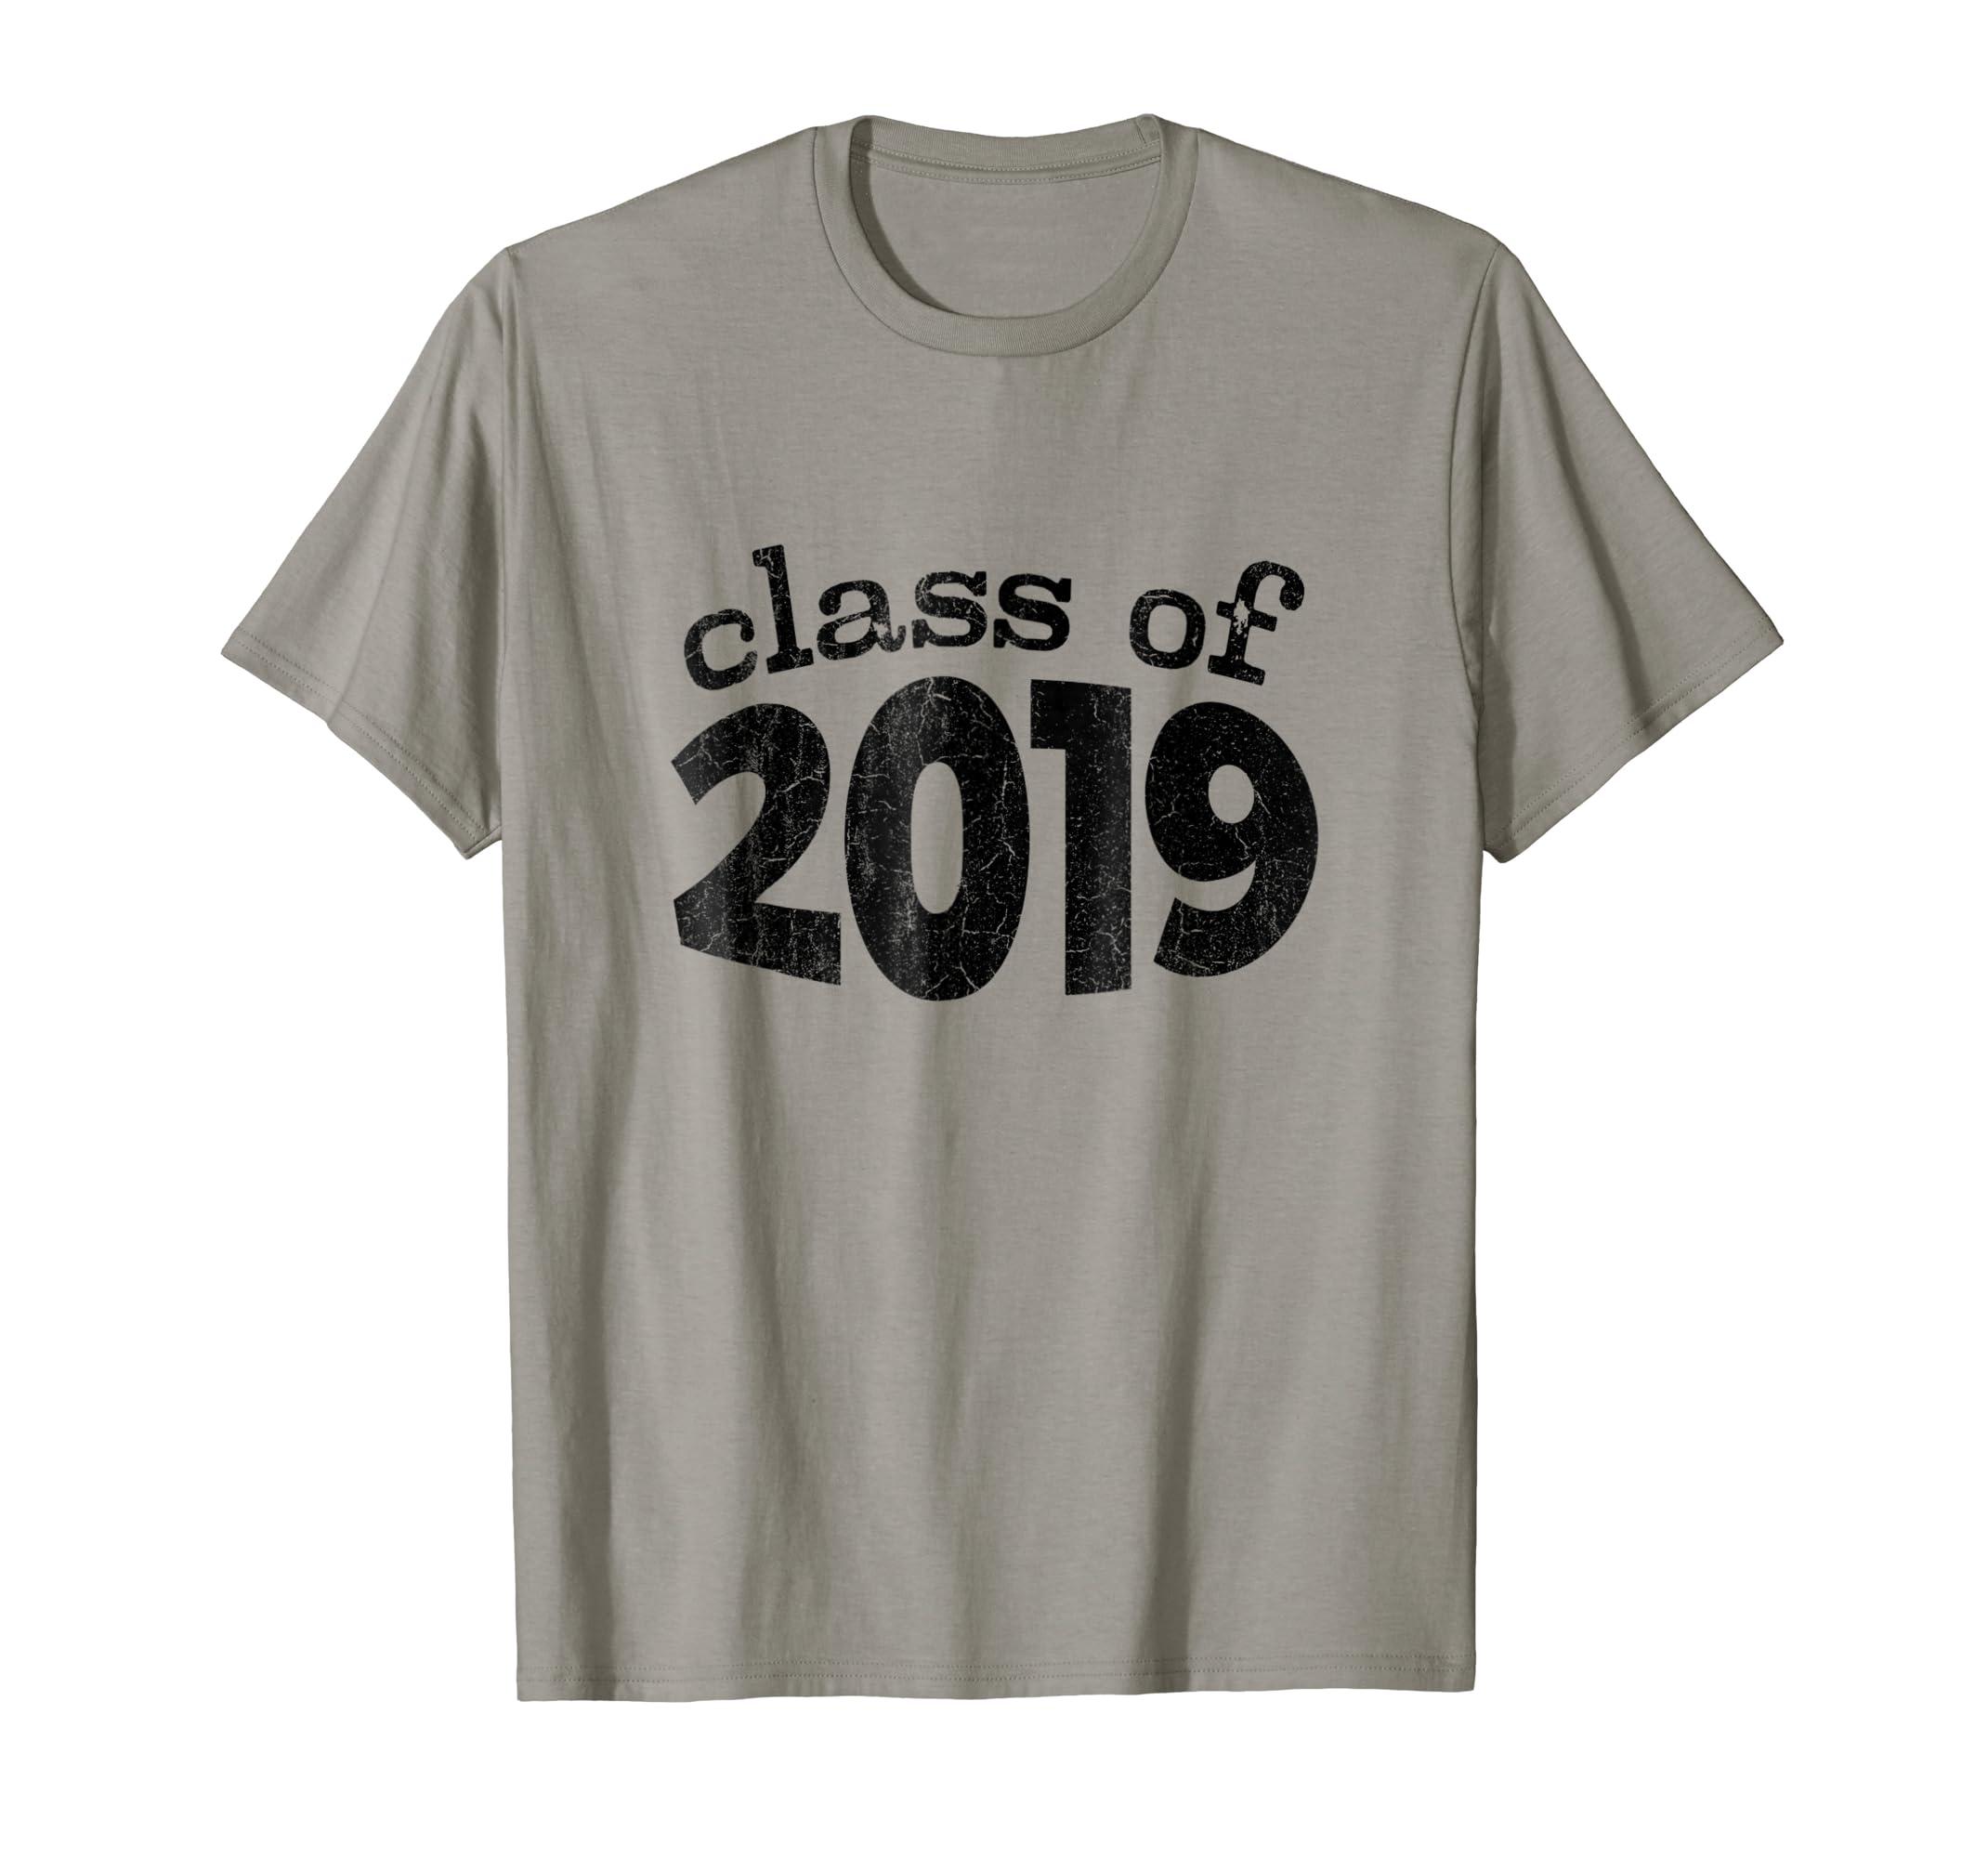 6e7673580 Amazon.com: Class of 2019 shirts 2019 Senior t-shirts for 2018 Juniors:  Clothing